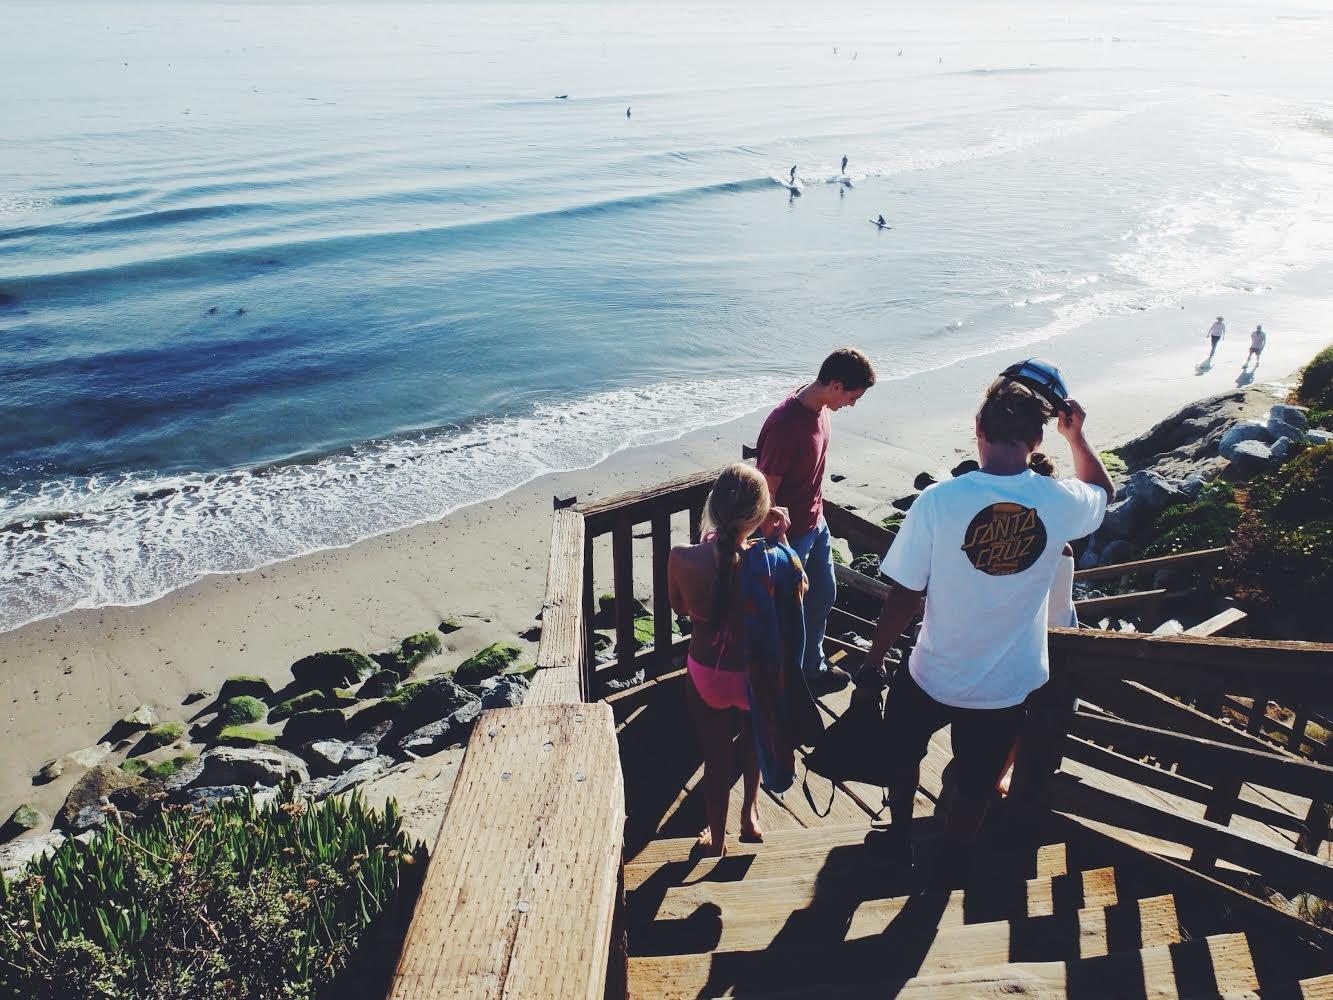 Santa Cruz - Surfers on a Beach